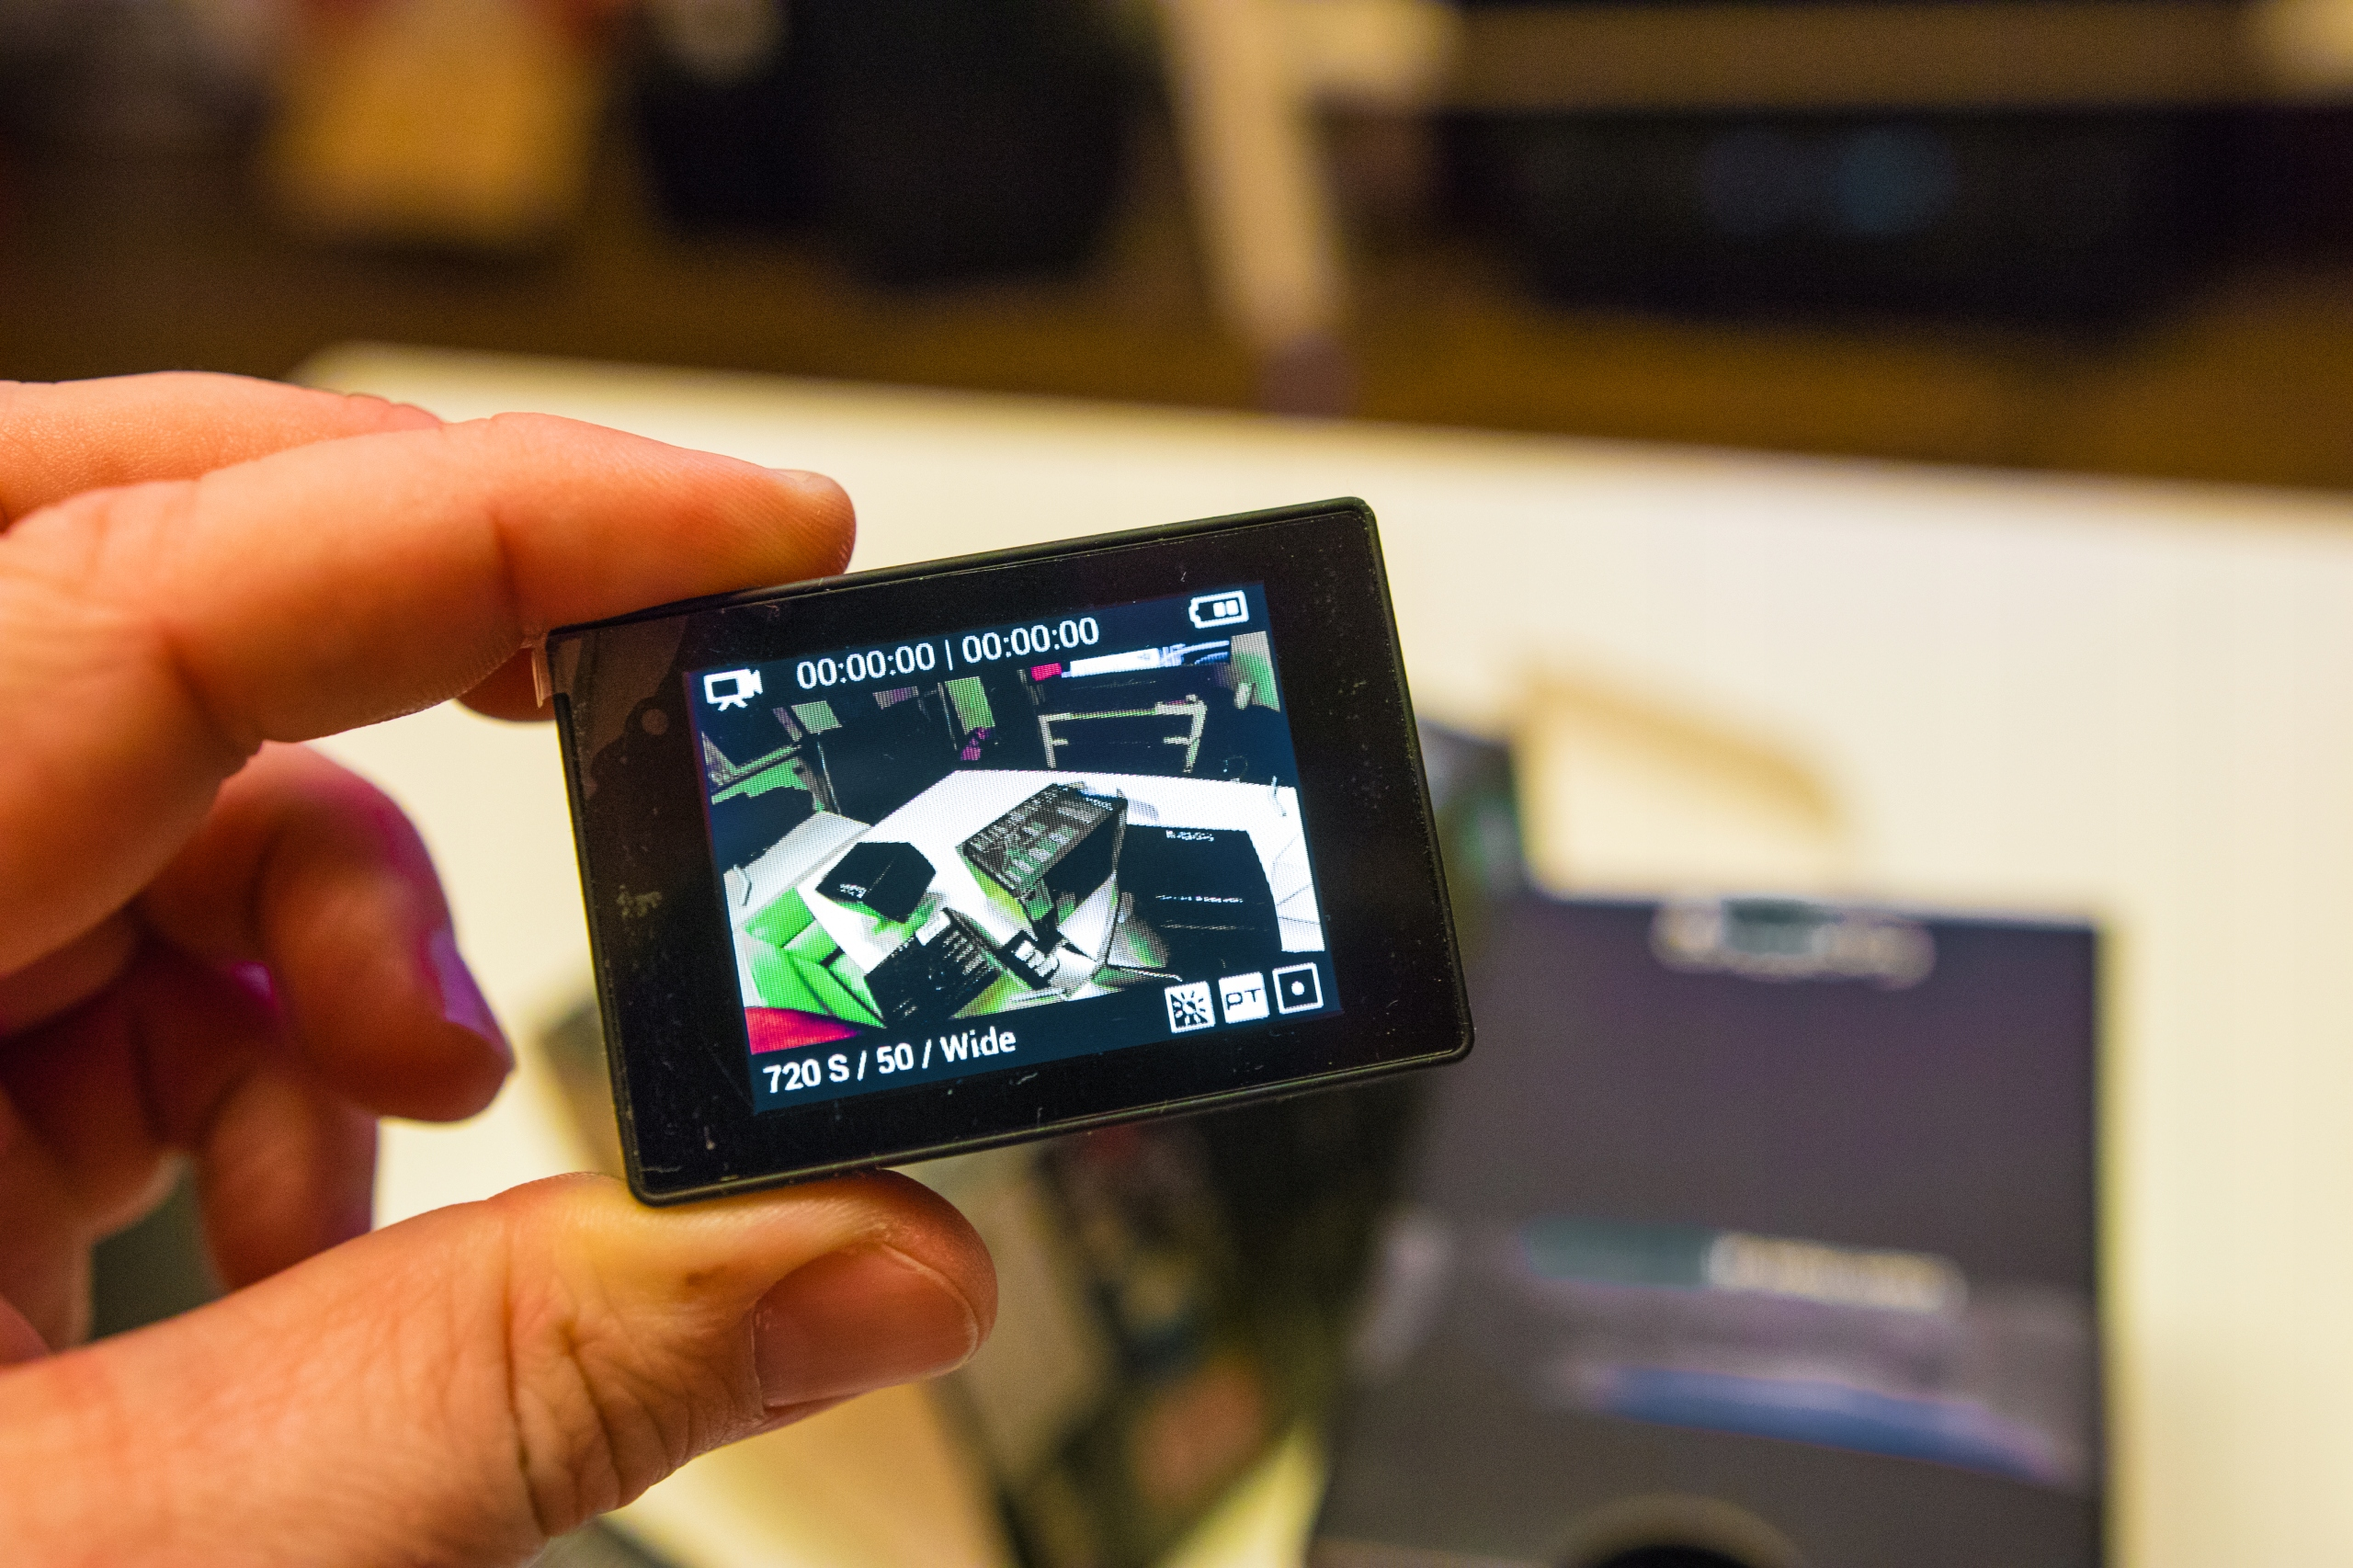 OKAZJA! GoPro Hero 4 Black, 2xBat, LCD Touch, 4K